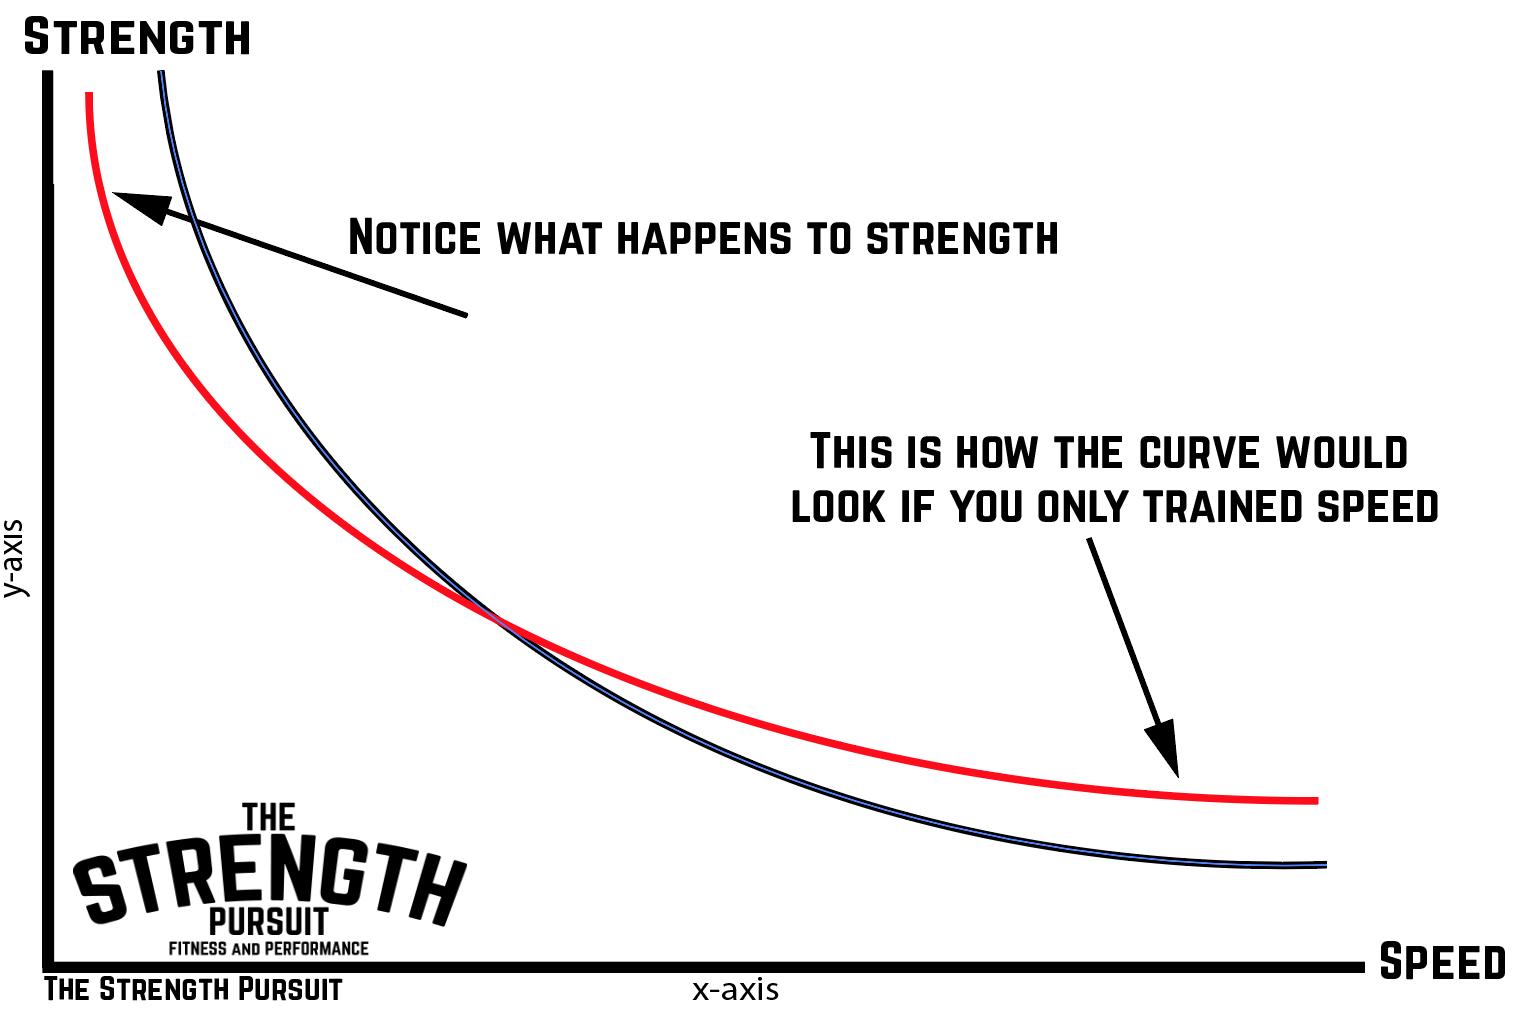 Just train speed